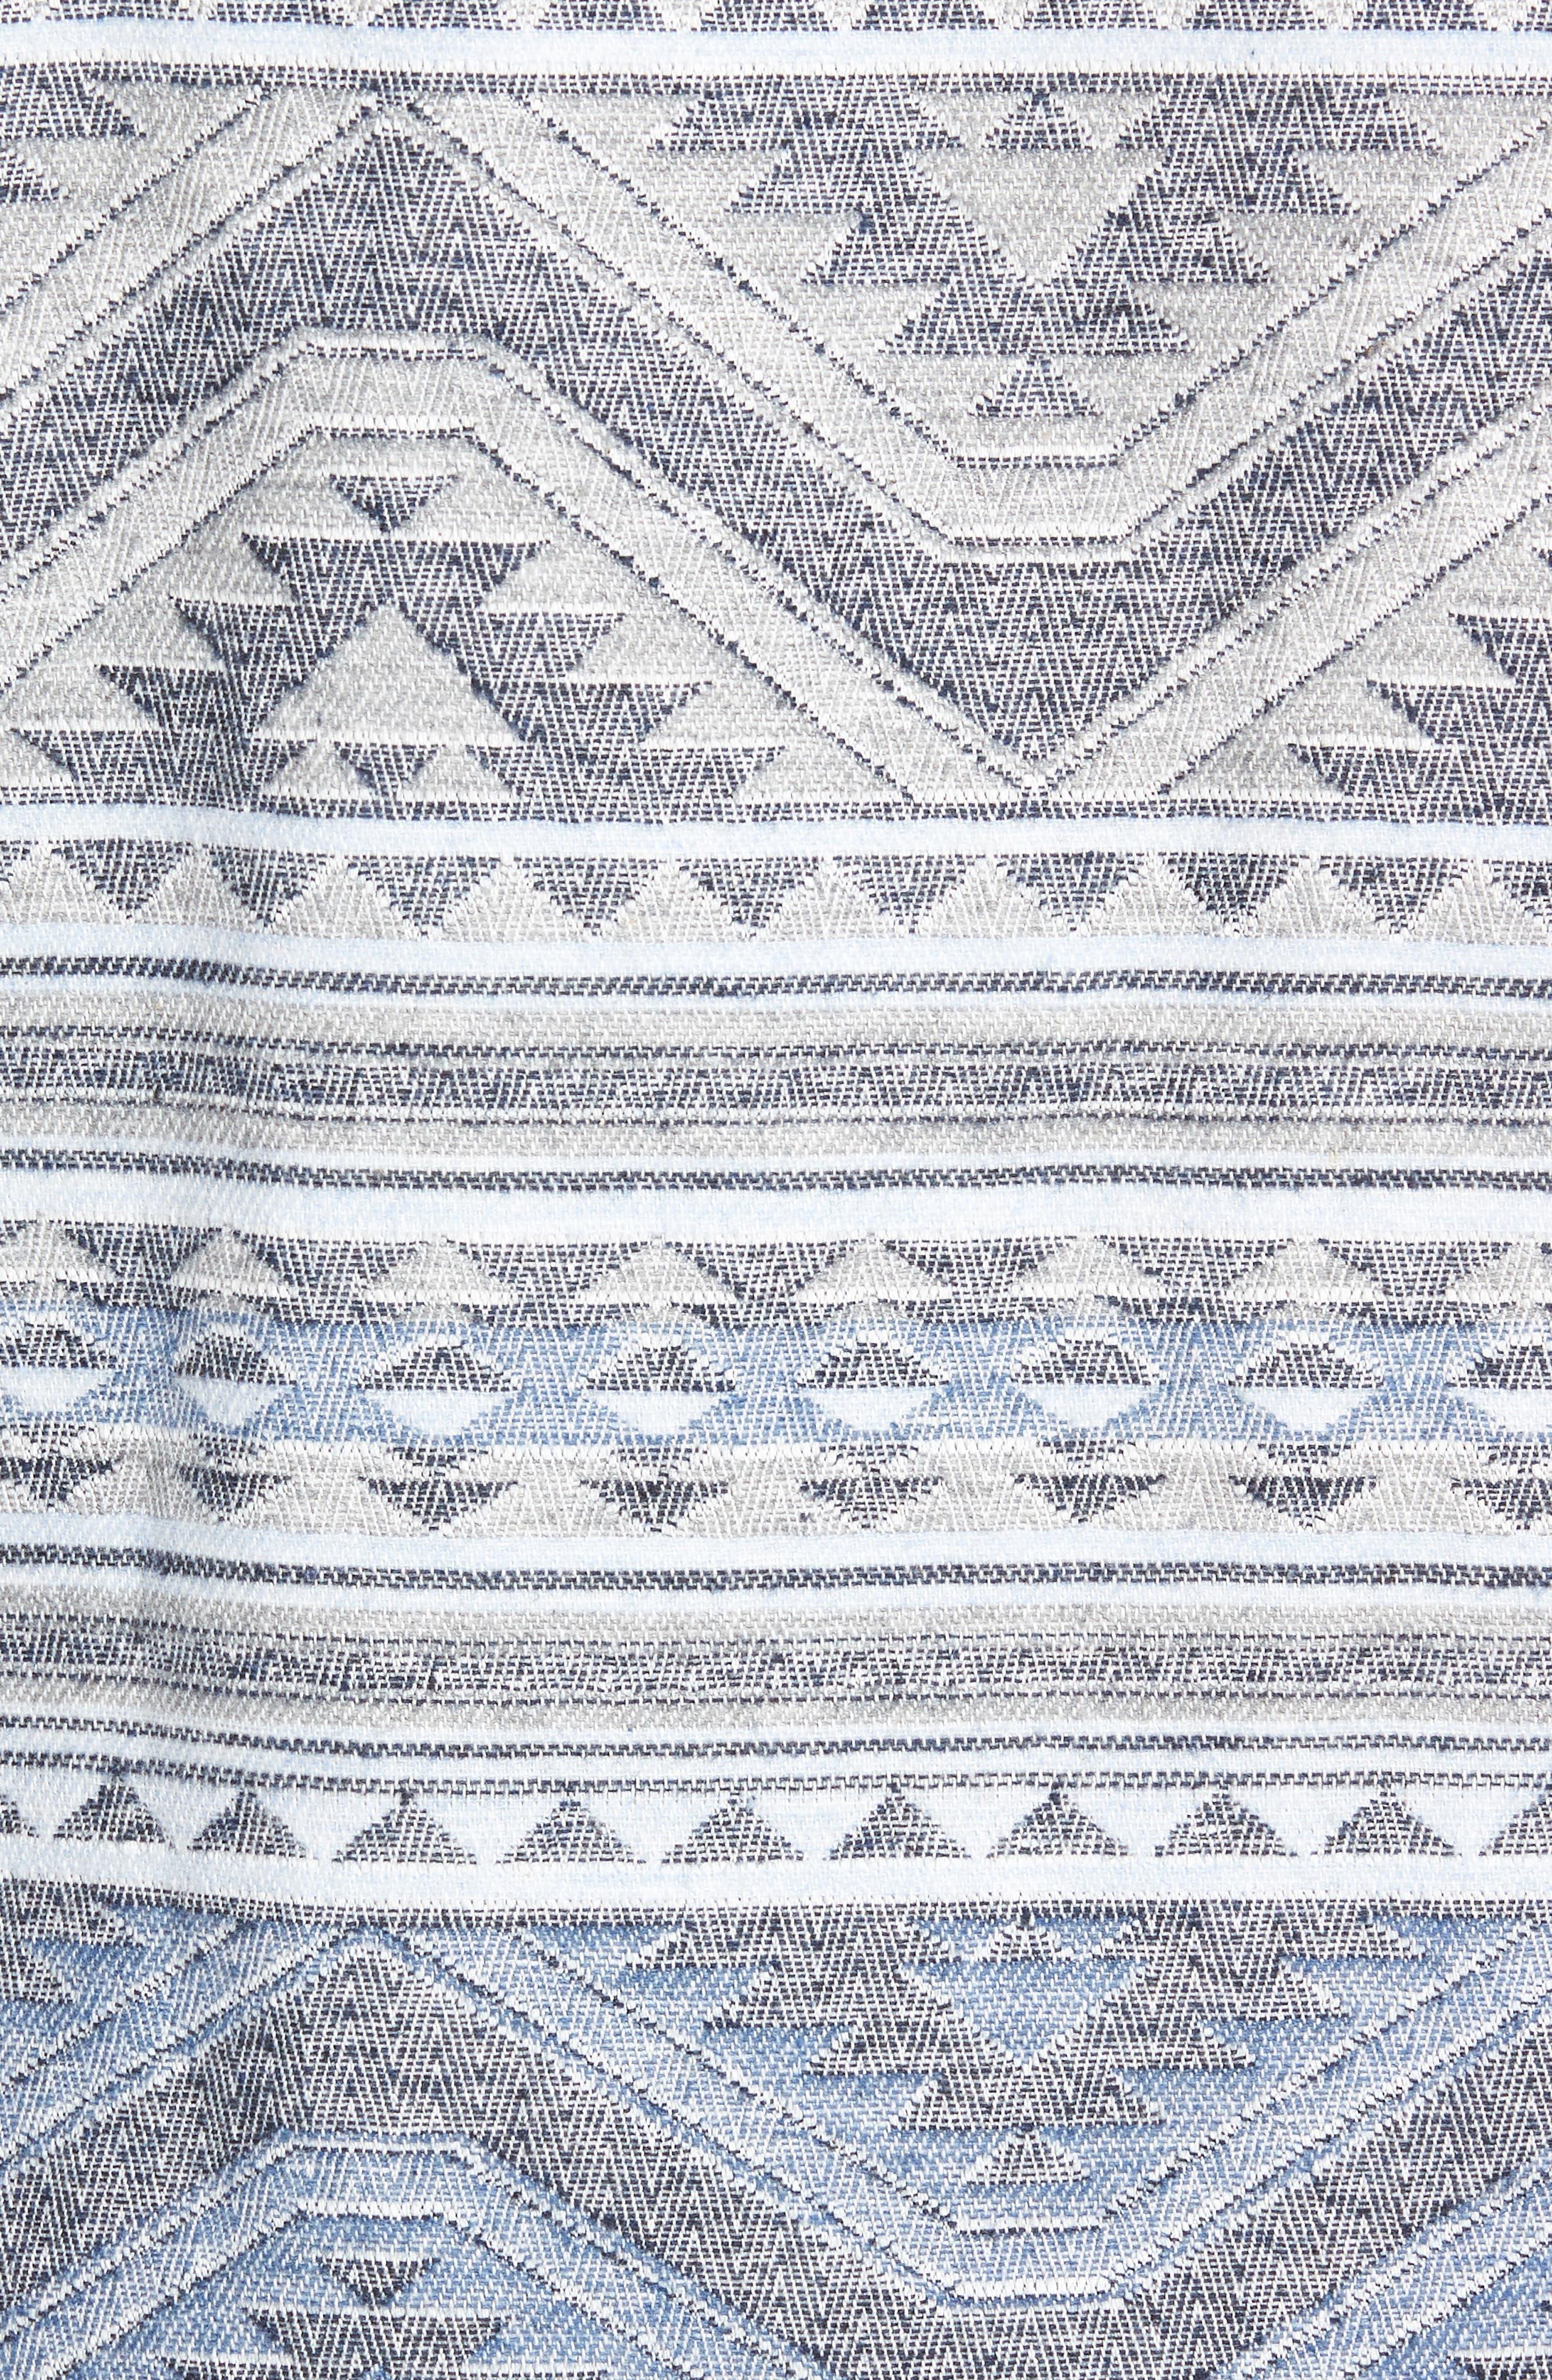 Durango CPO Cotton Work Shirt,                             Alternate thumbnail 7, color,                             TWILIGHT GLACIER